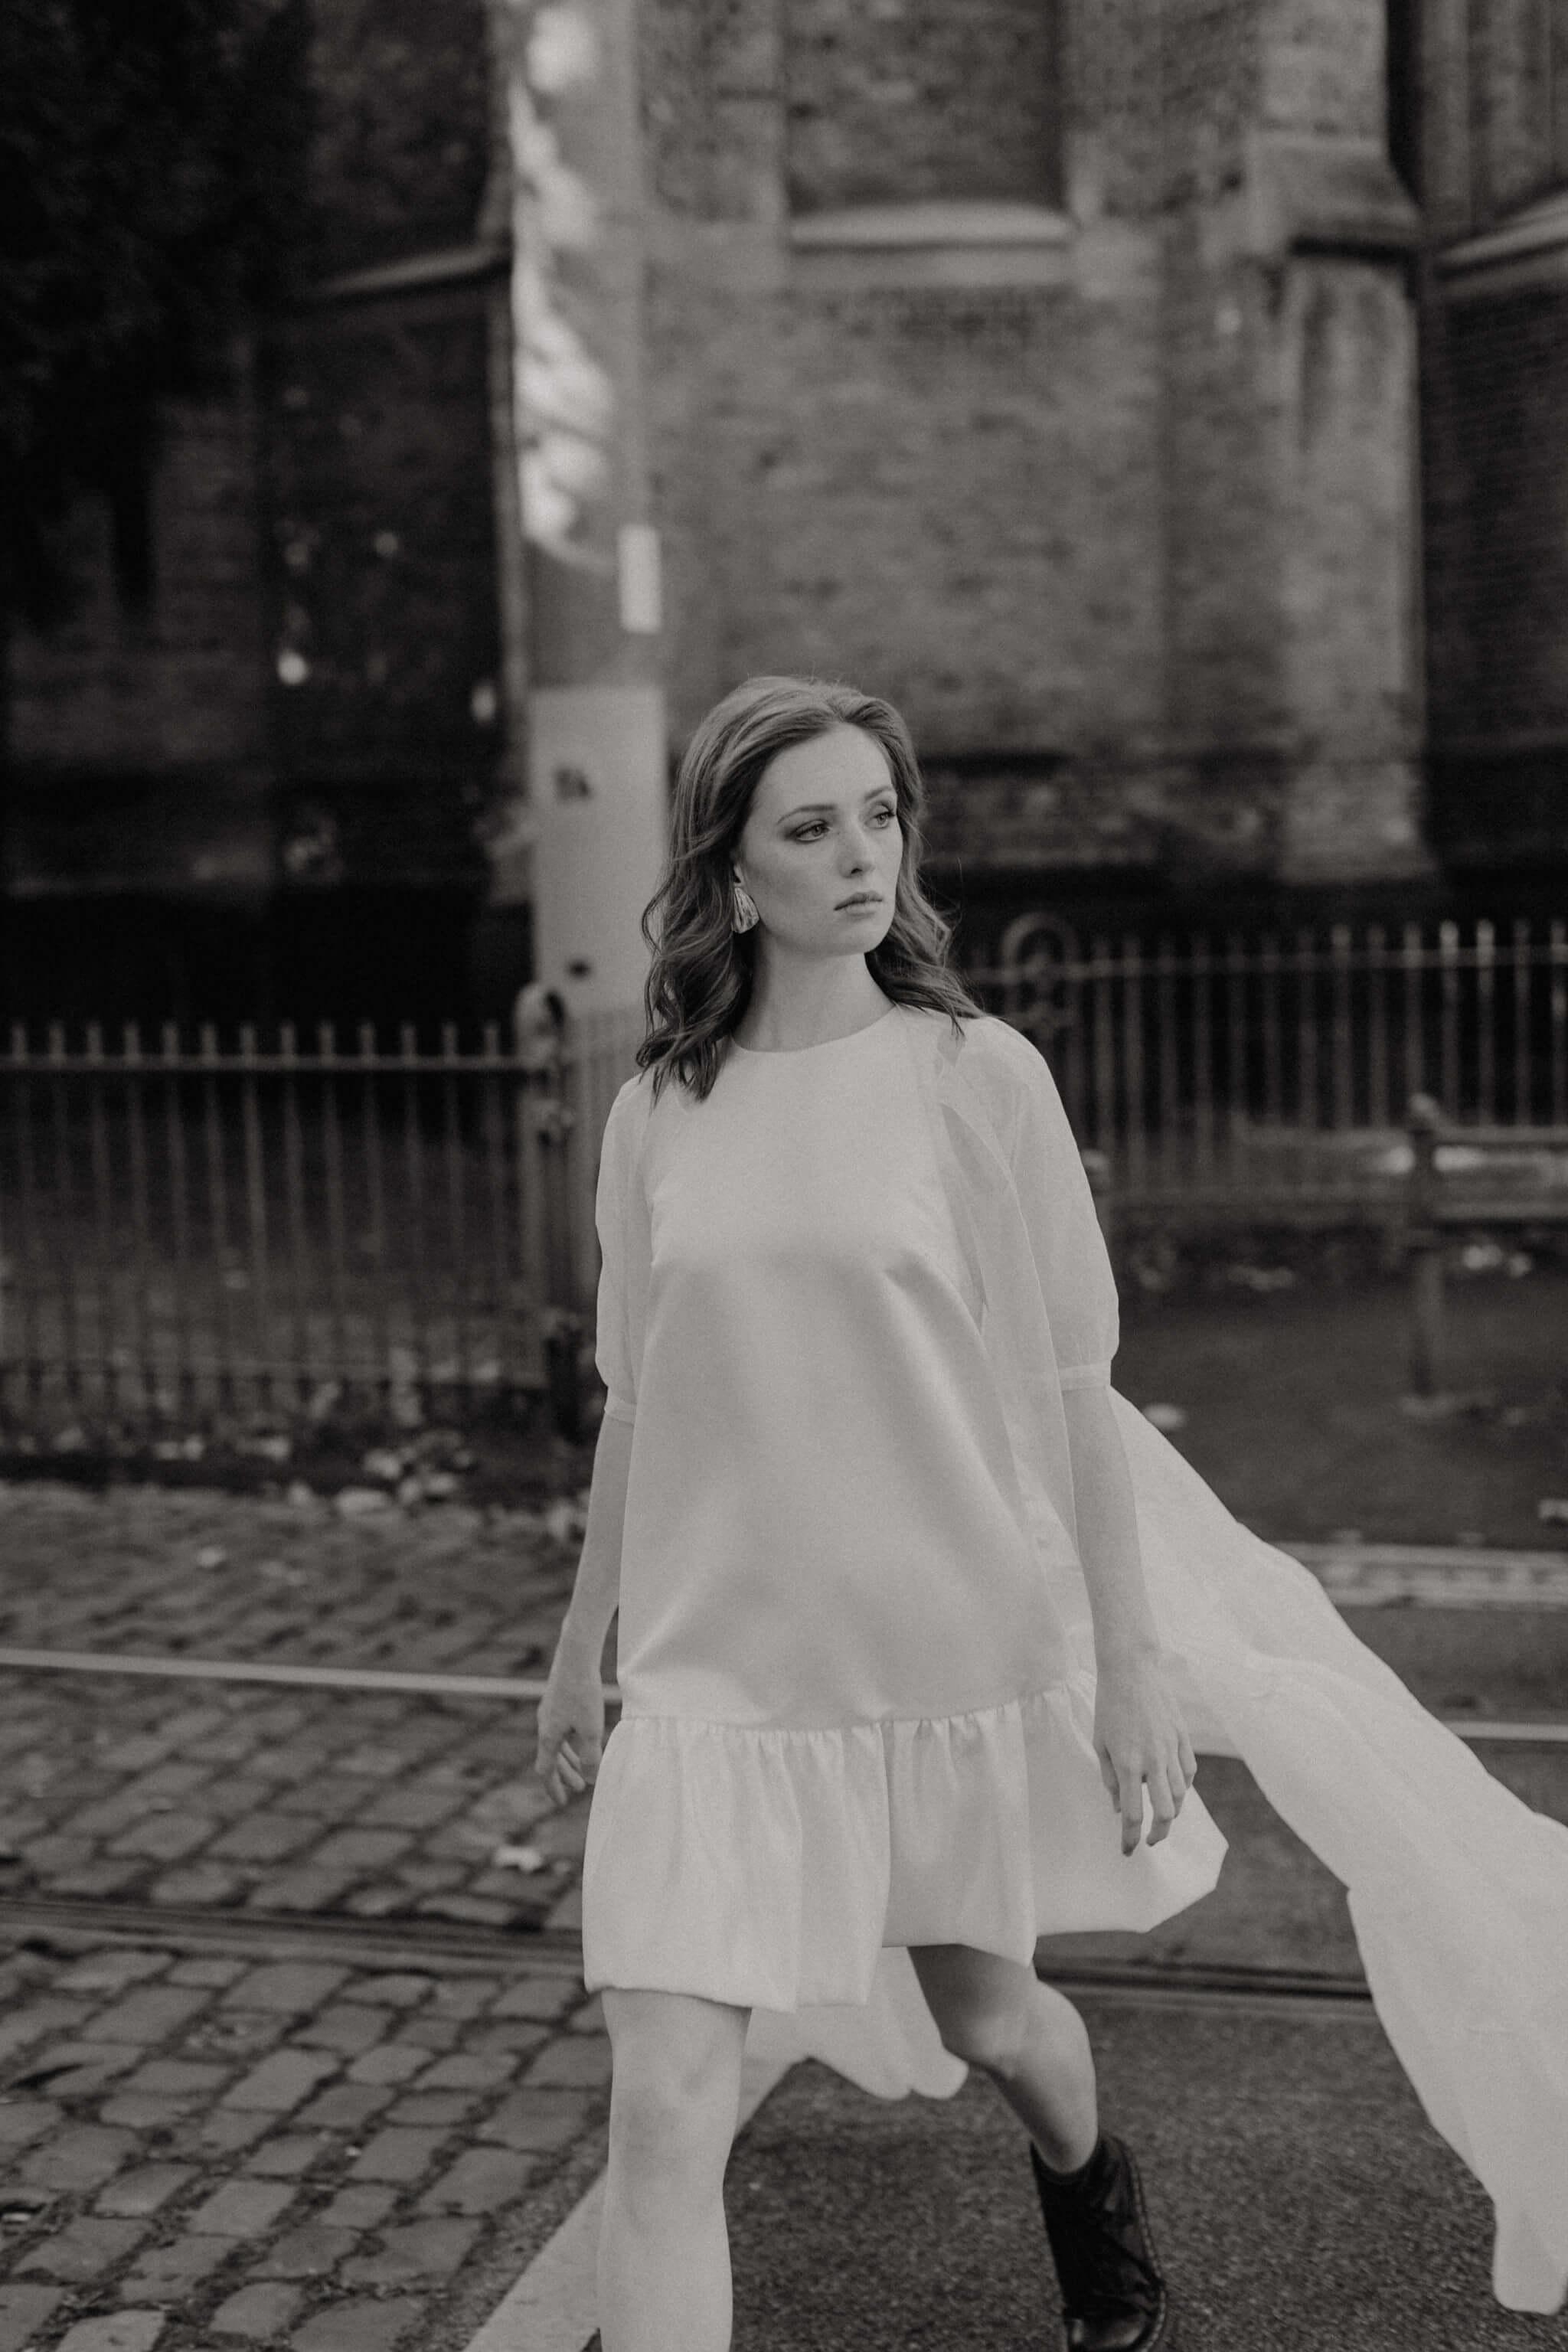 autum styleshoot leonie rosendahl 88 -